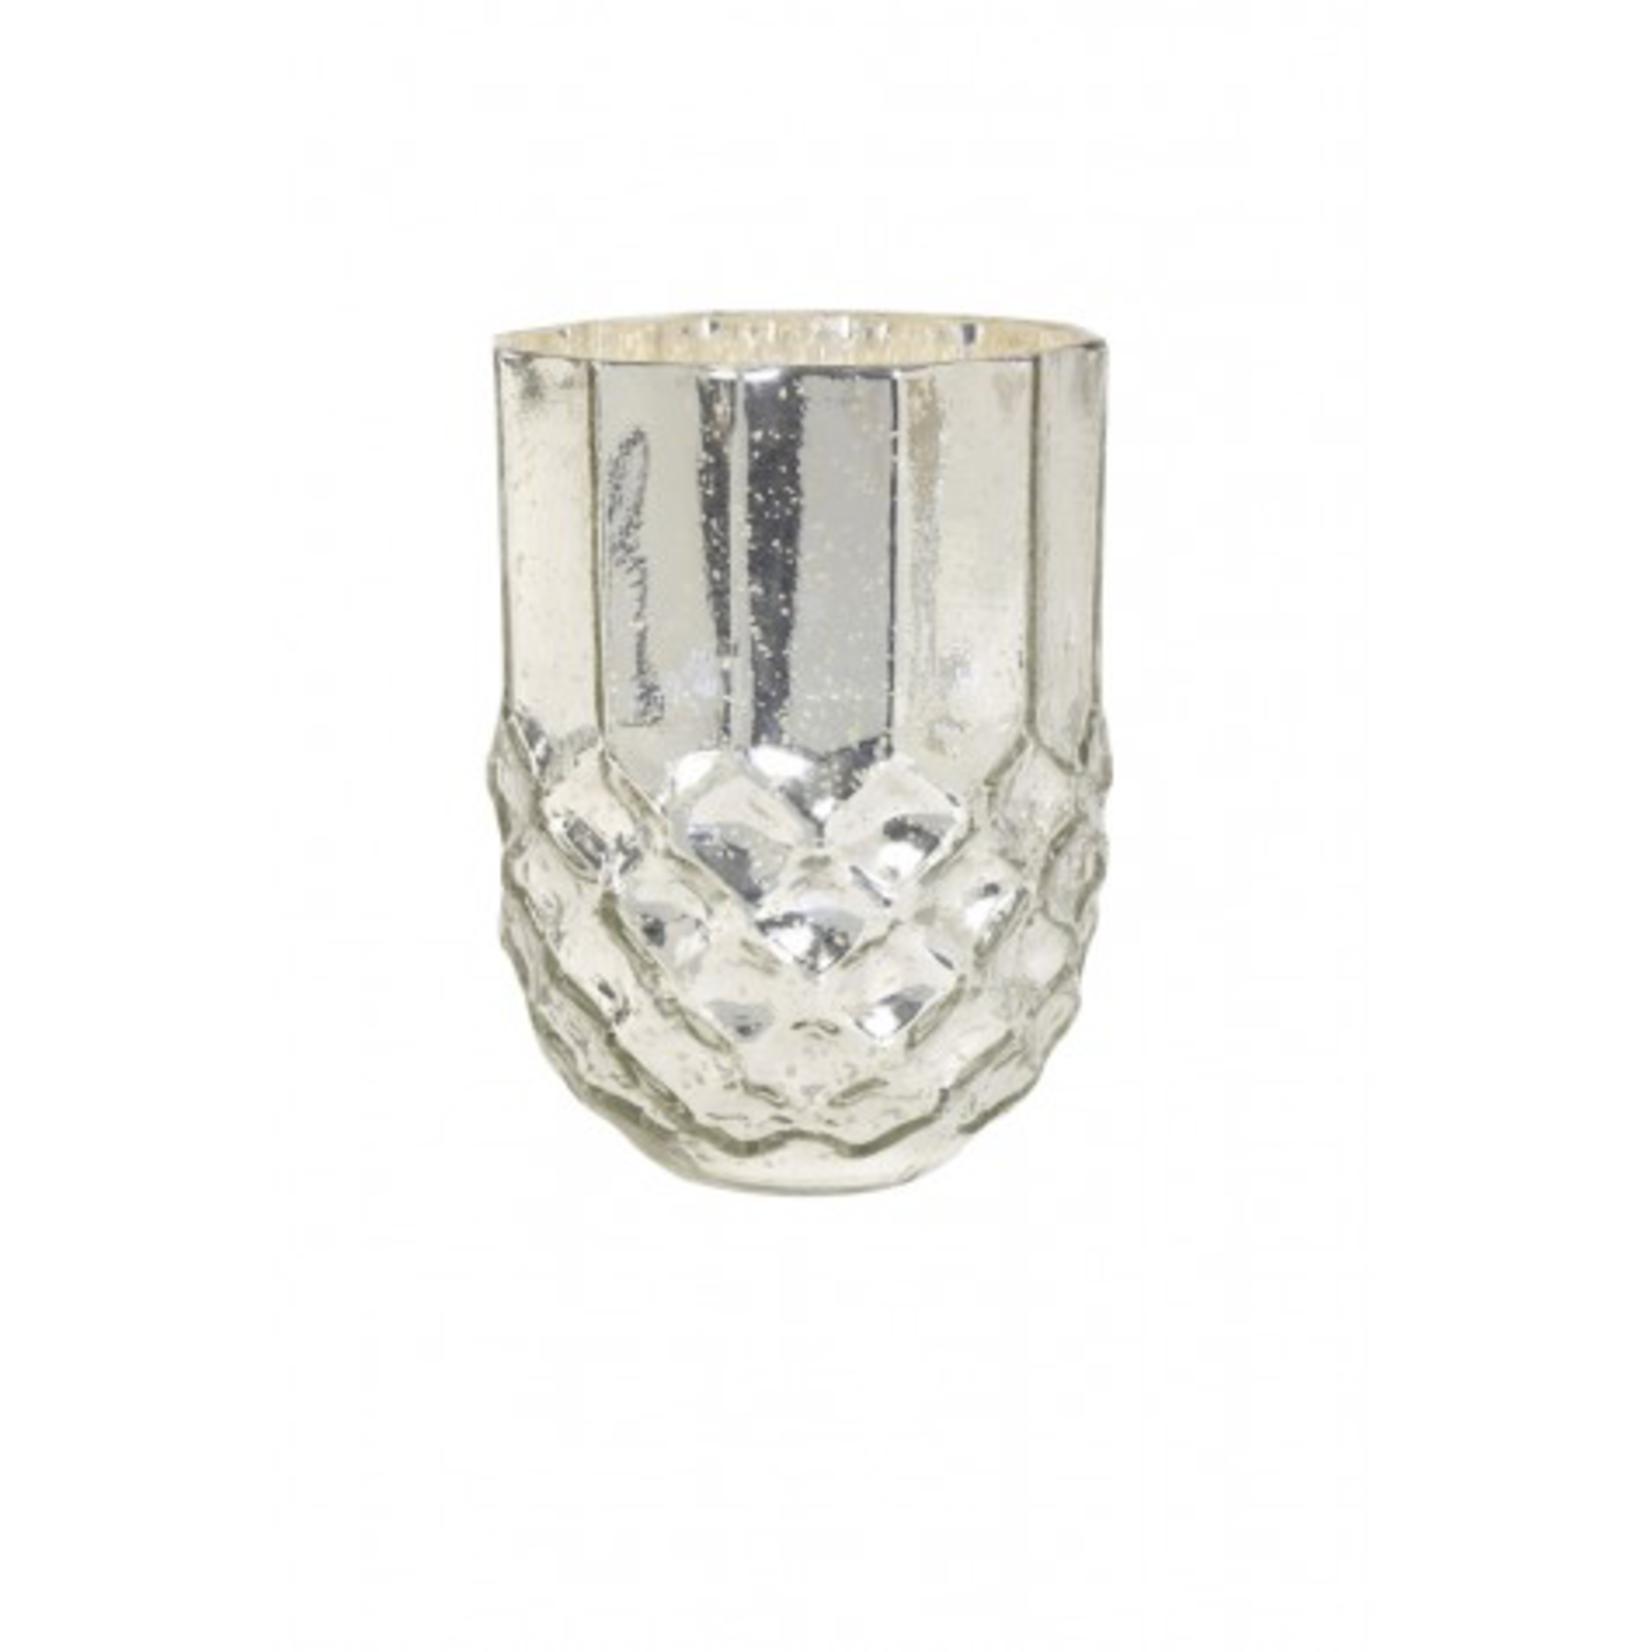 Light & Living DADU  LARGE Ant Silver Tealight Candle Holder 10 x 5 x 15cm